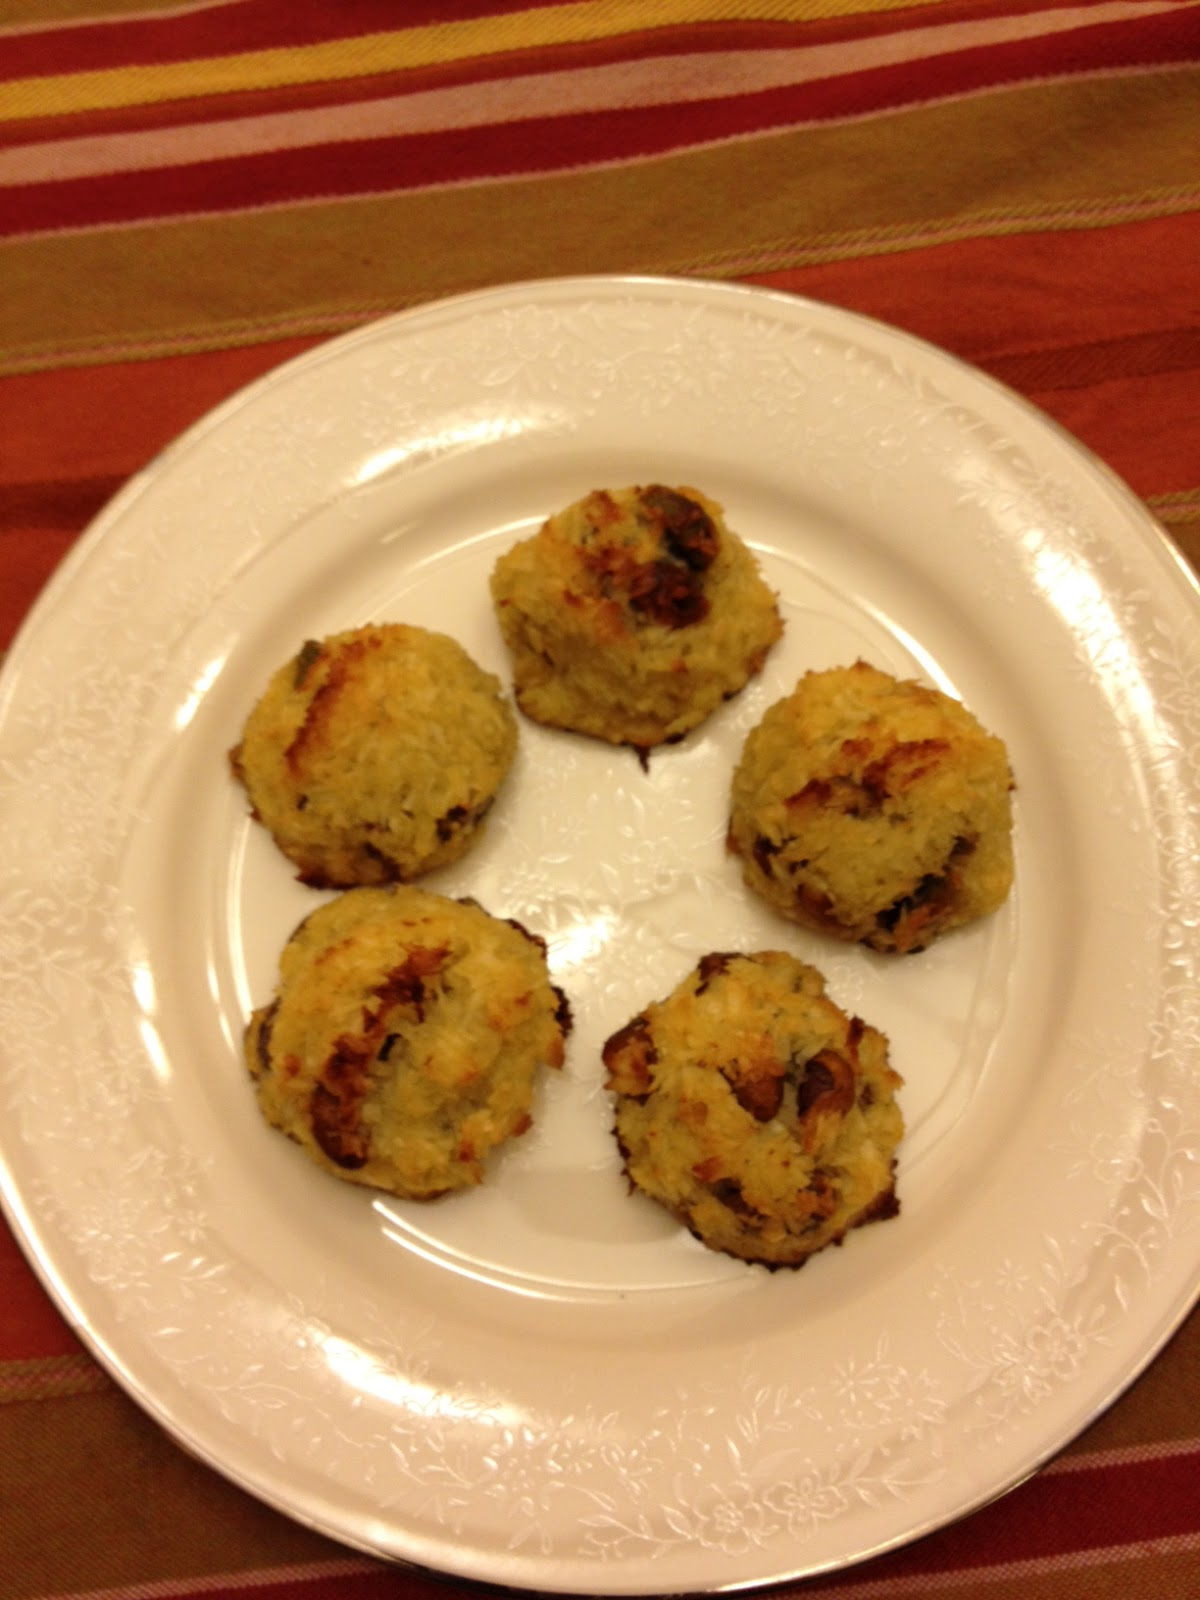 Feeding Ger Sasser: Paleo Coconut Pistachio Macaroons